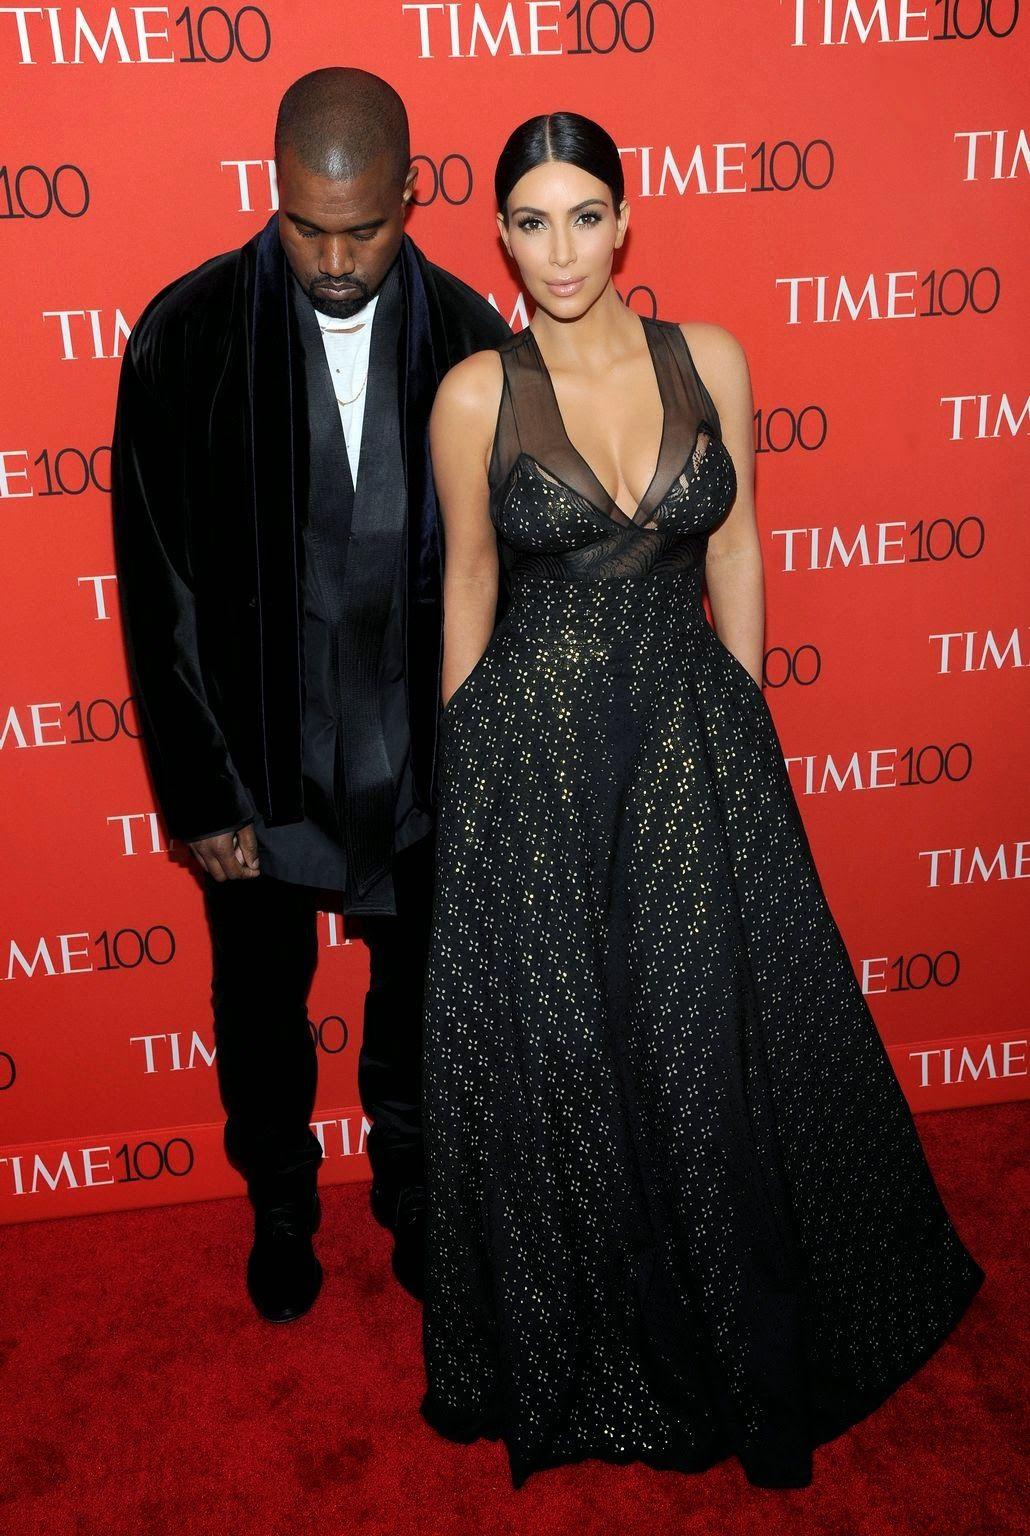 Kim kardashian bares cleavage alongside kanye west at the time